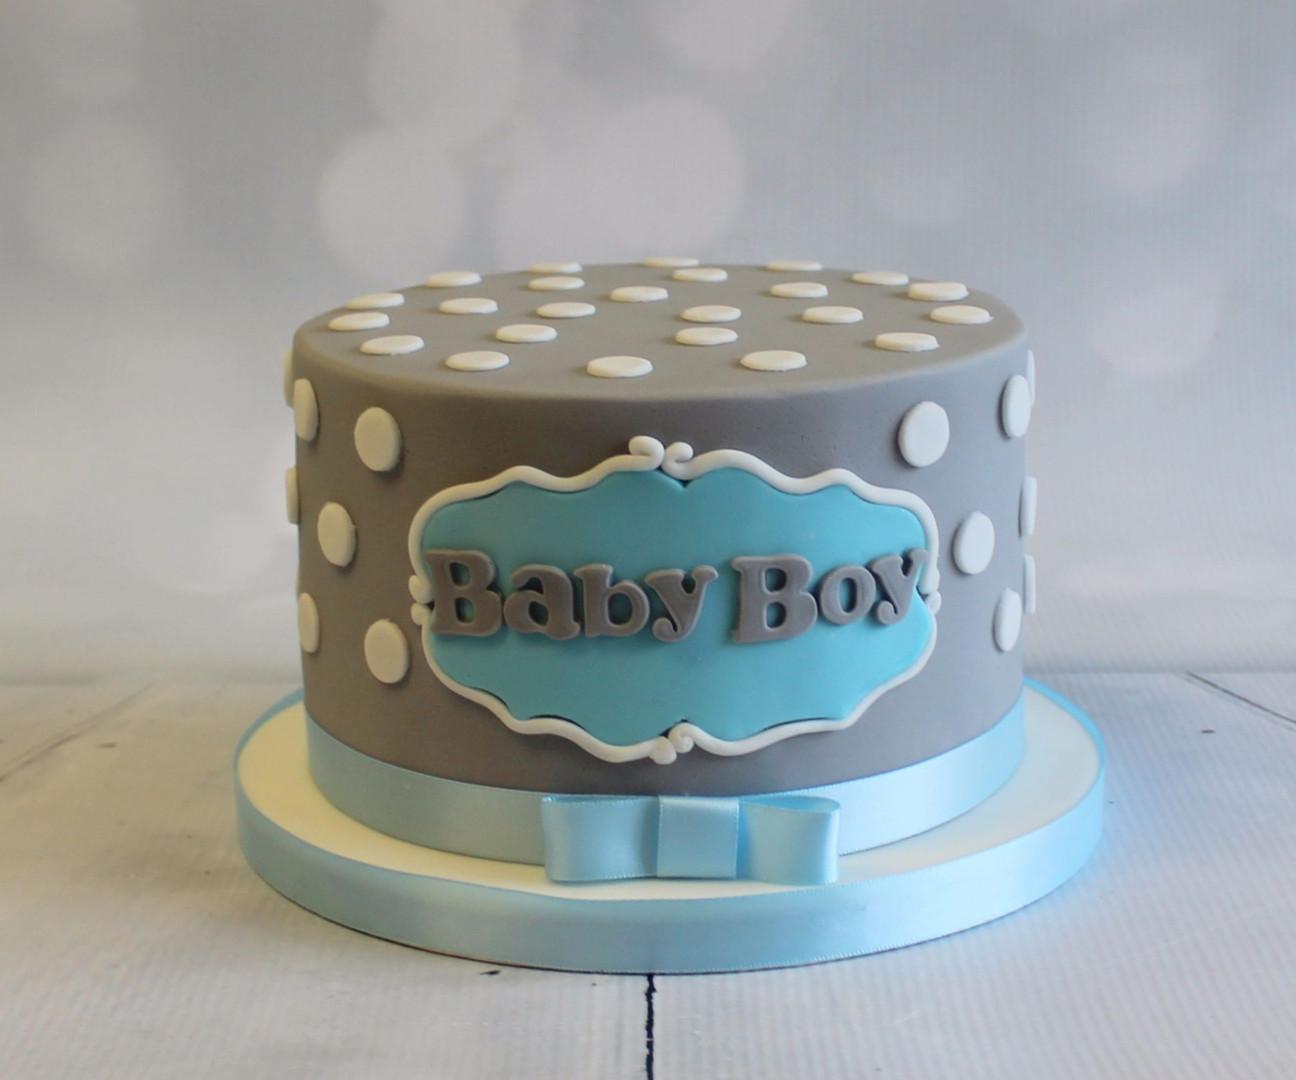 Baby Boy Simple Polka Dot Cake.jpg